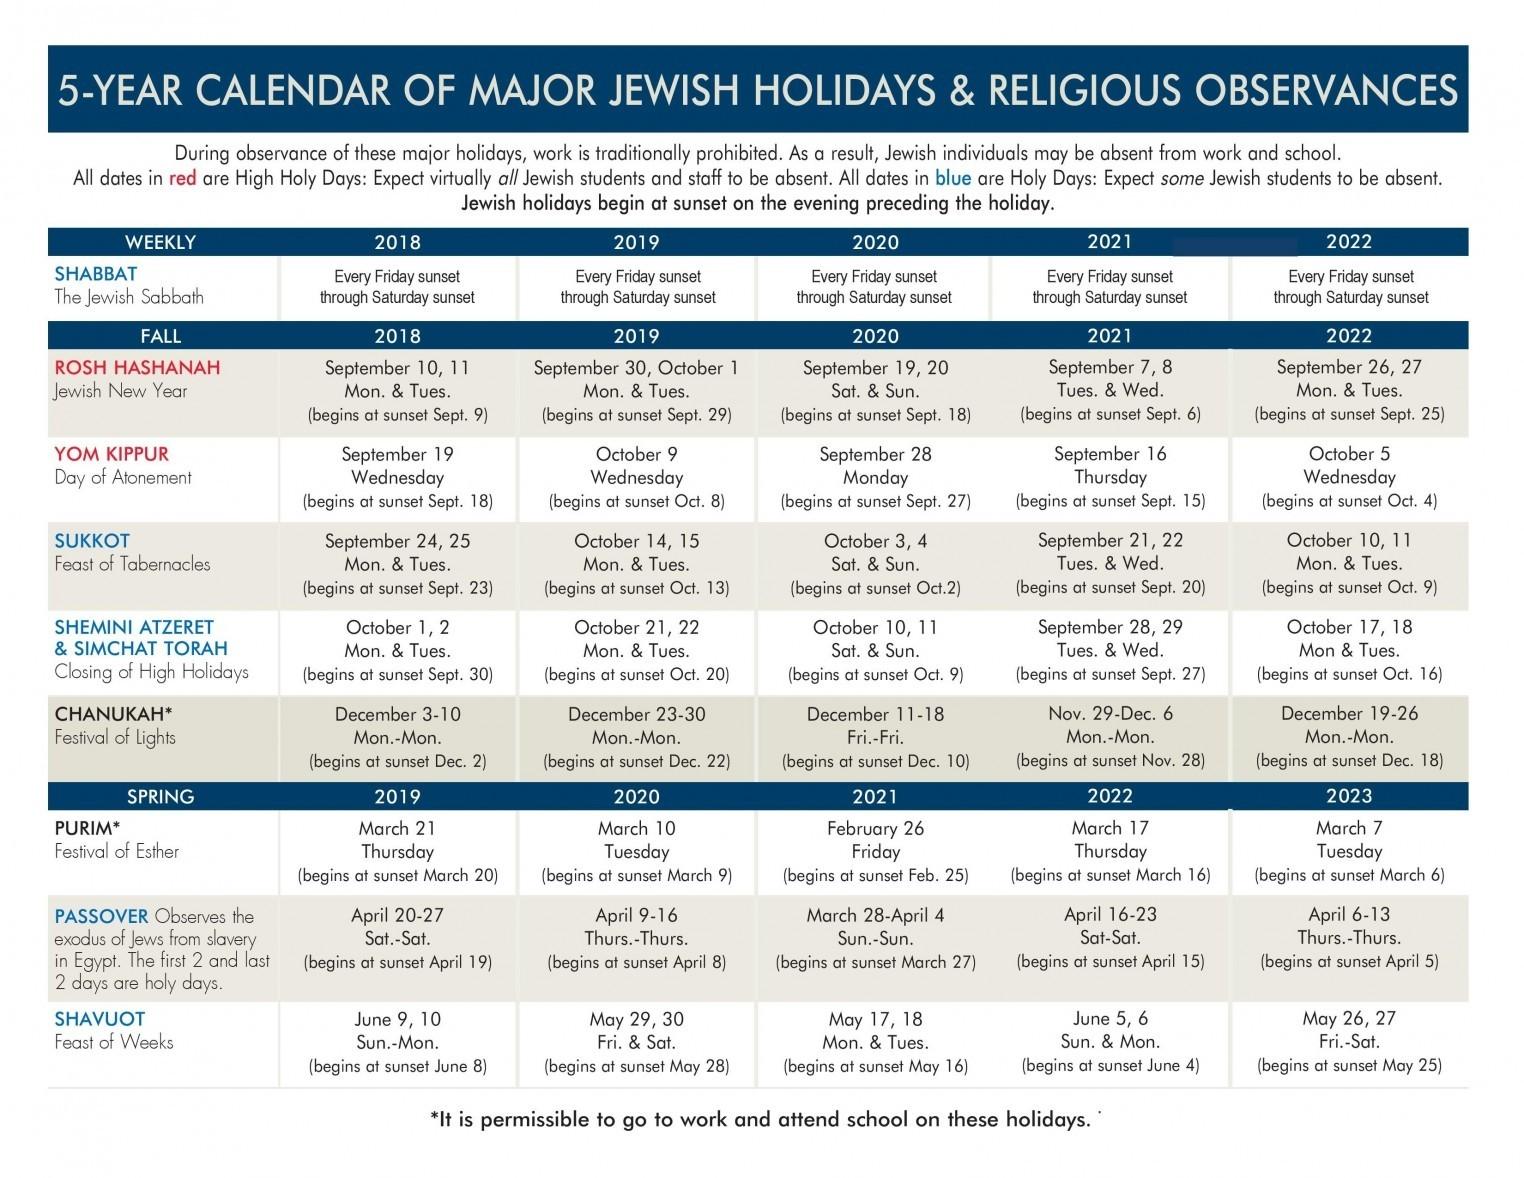 5-Year Jewish Holiday Calendar | Jewish Federation Of-Jewish Holidays Calendar 2020